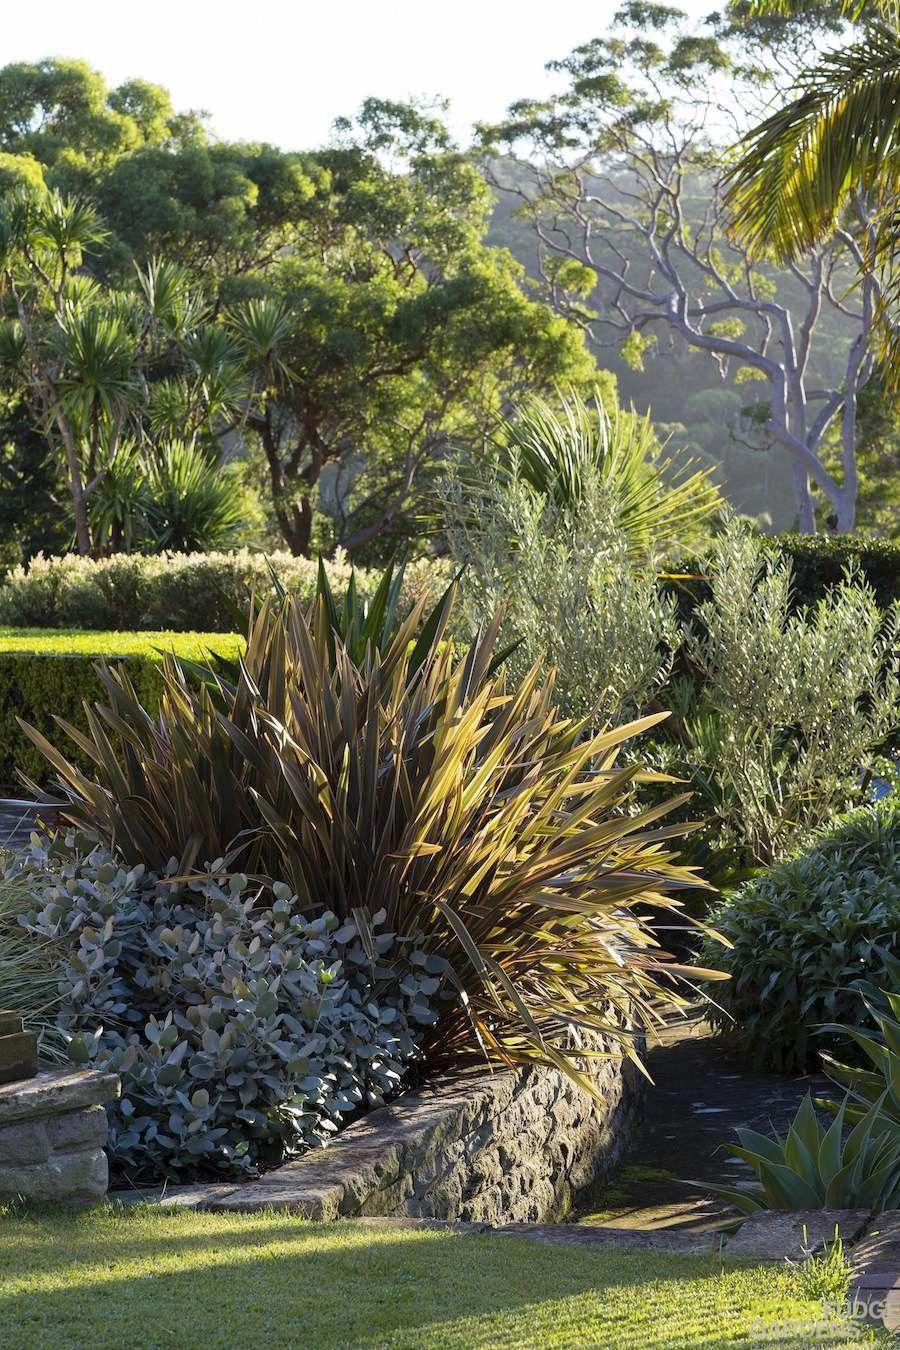 dac5513068f5b7bf3cb2b04b64b4cb6a - How To Start A Gardening Business Australia